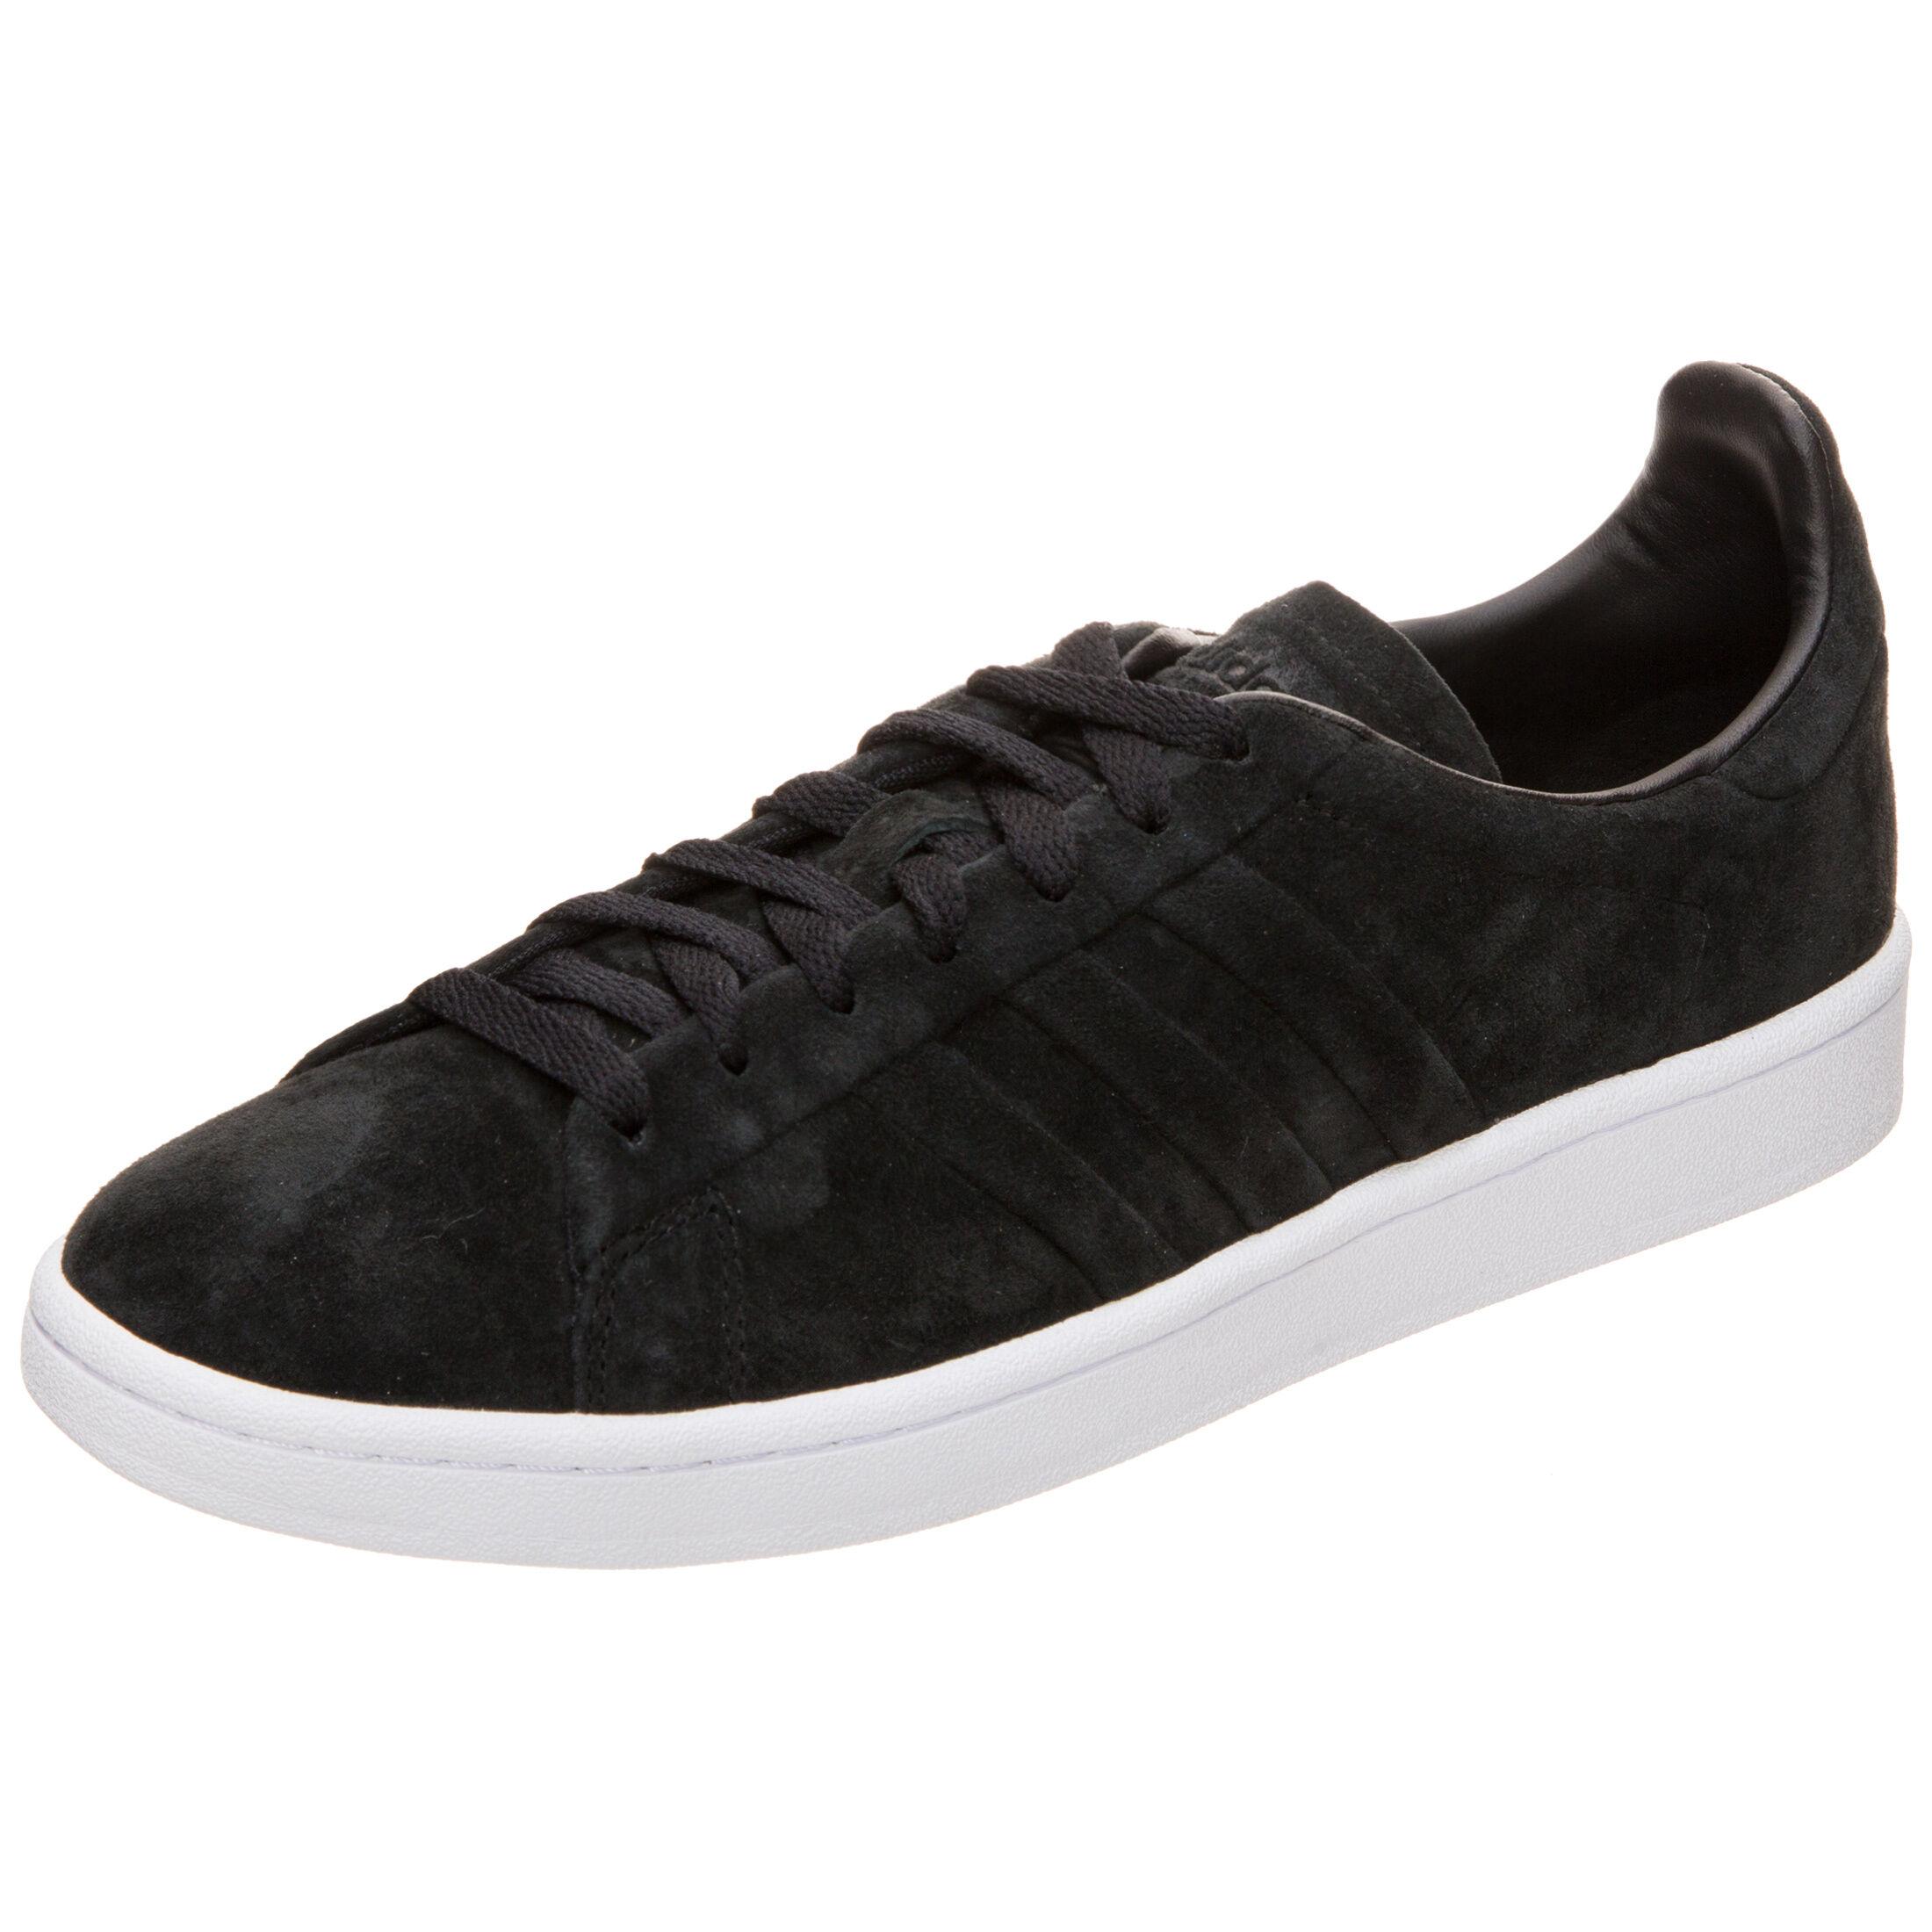 Outfitter OriginalsFrauen Lifestyle Bei Adidas Schuhe kXTiOuPZ